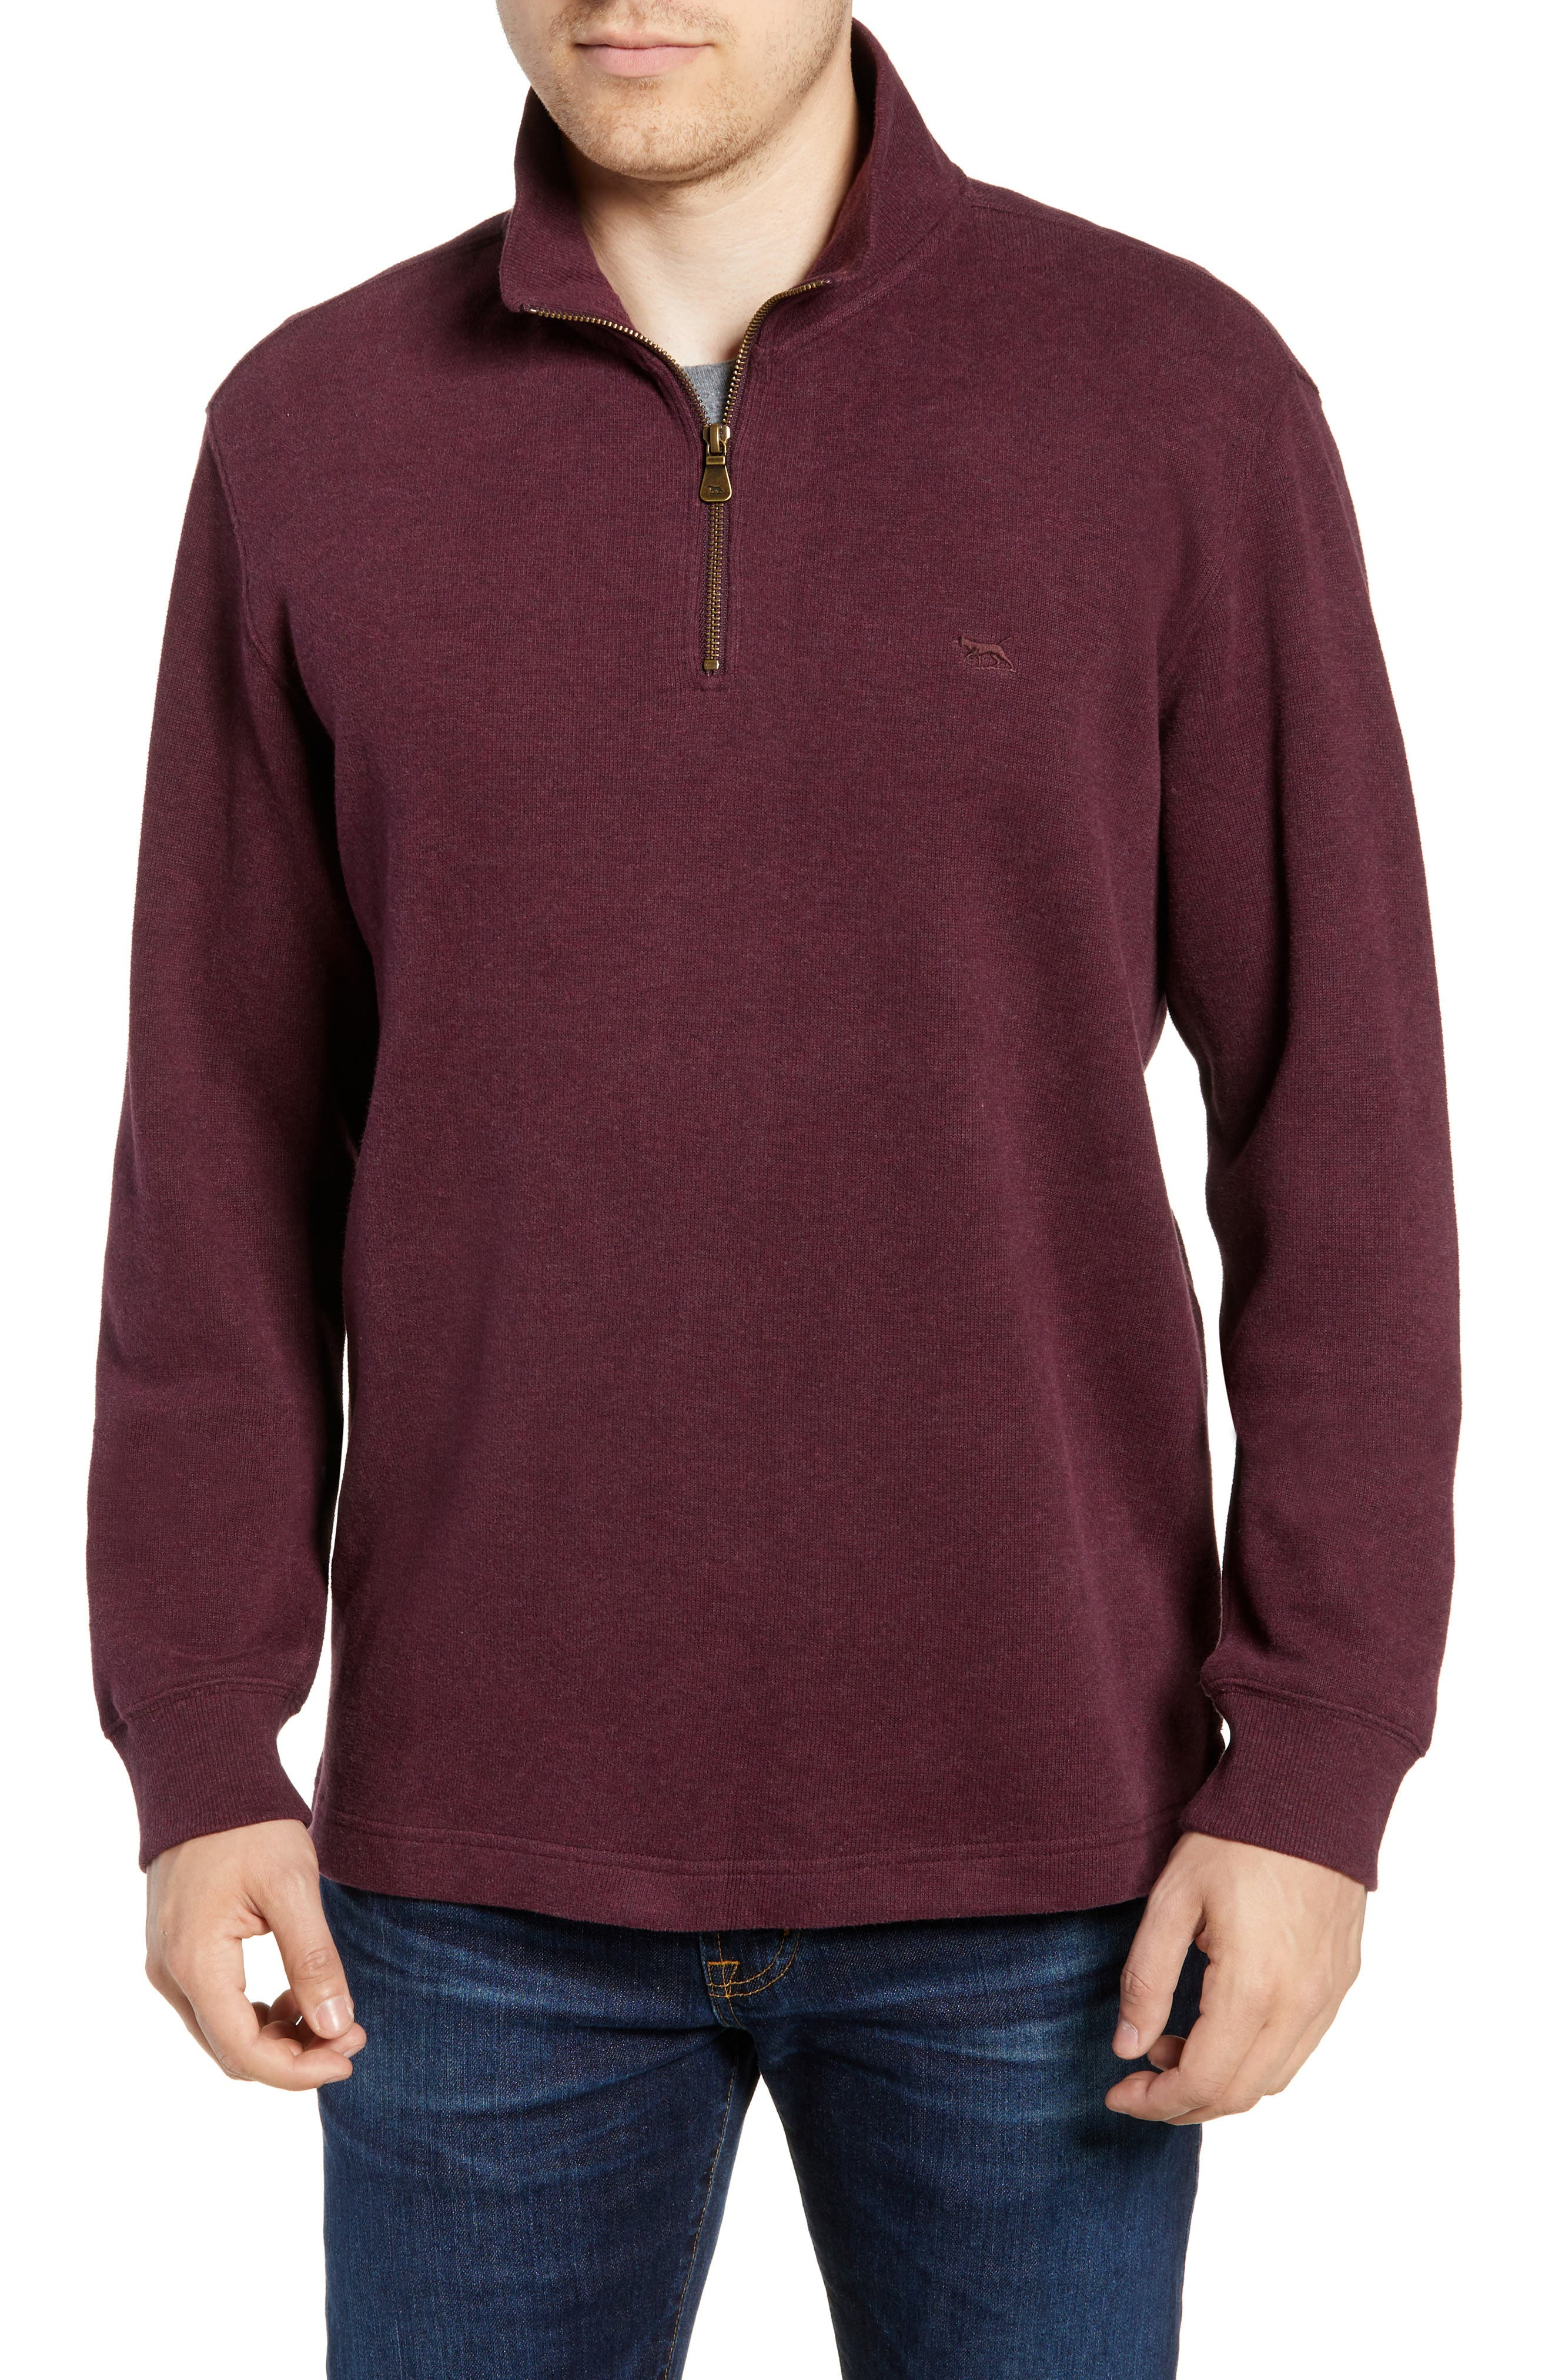 RODD & GUNN Alton Ave Regular Fit Pullover Sweatshirt, Main, color, BURGUNDY